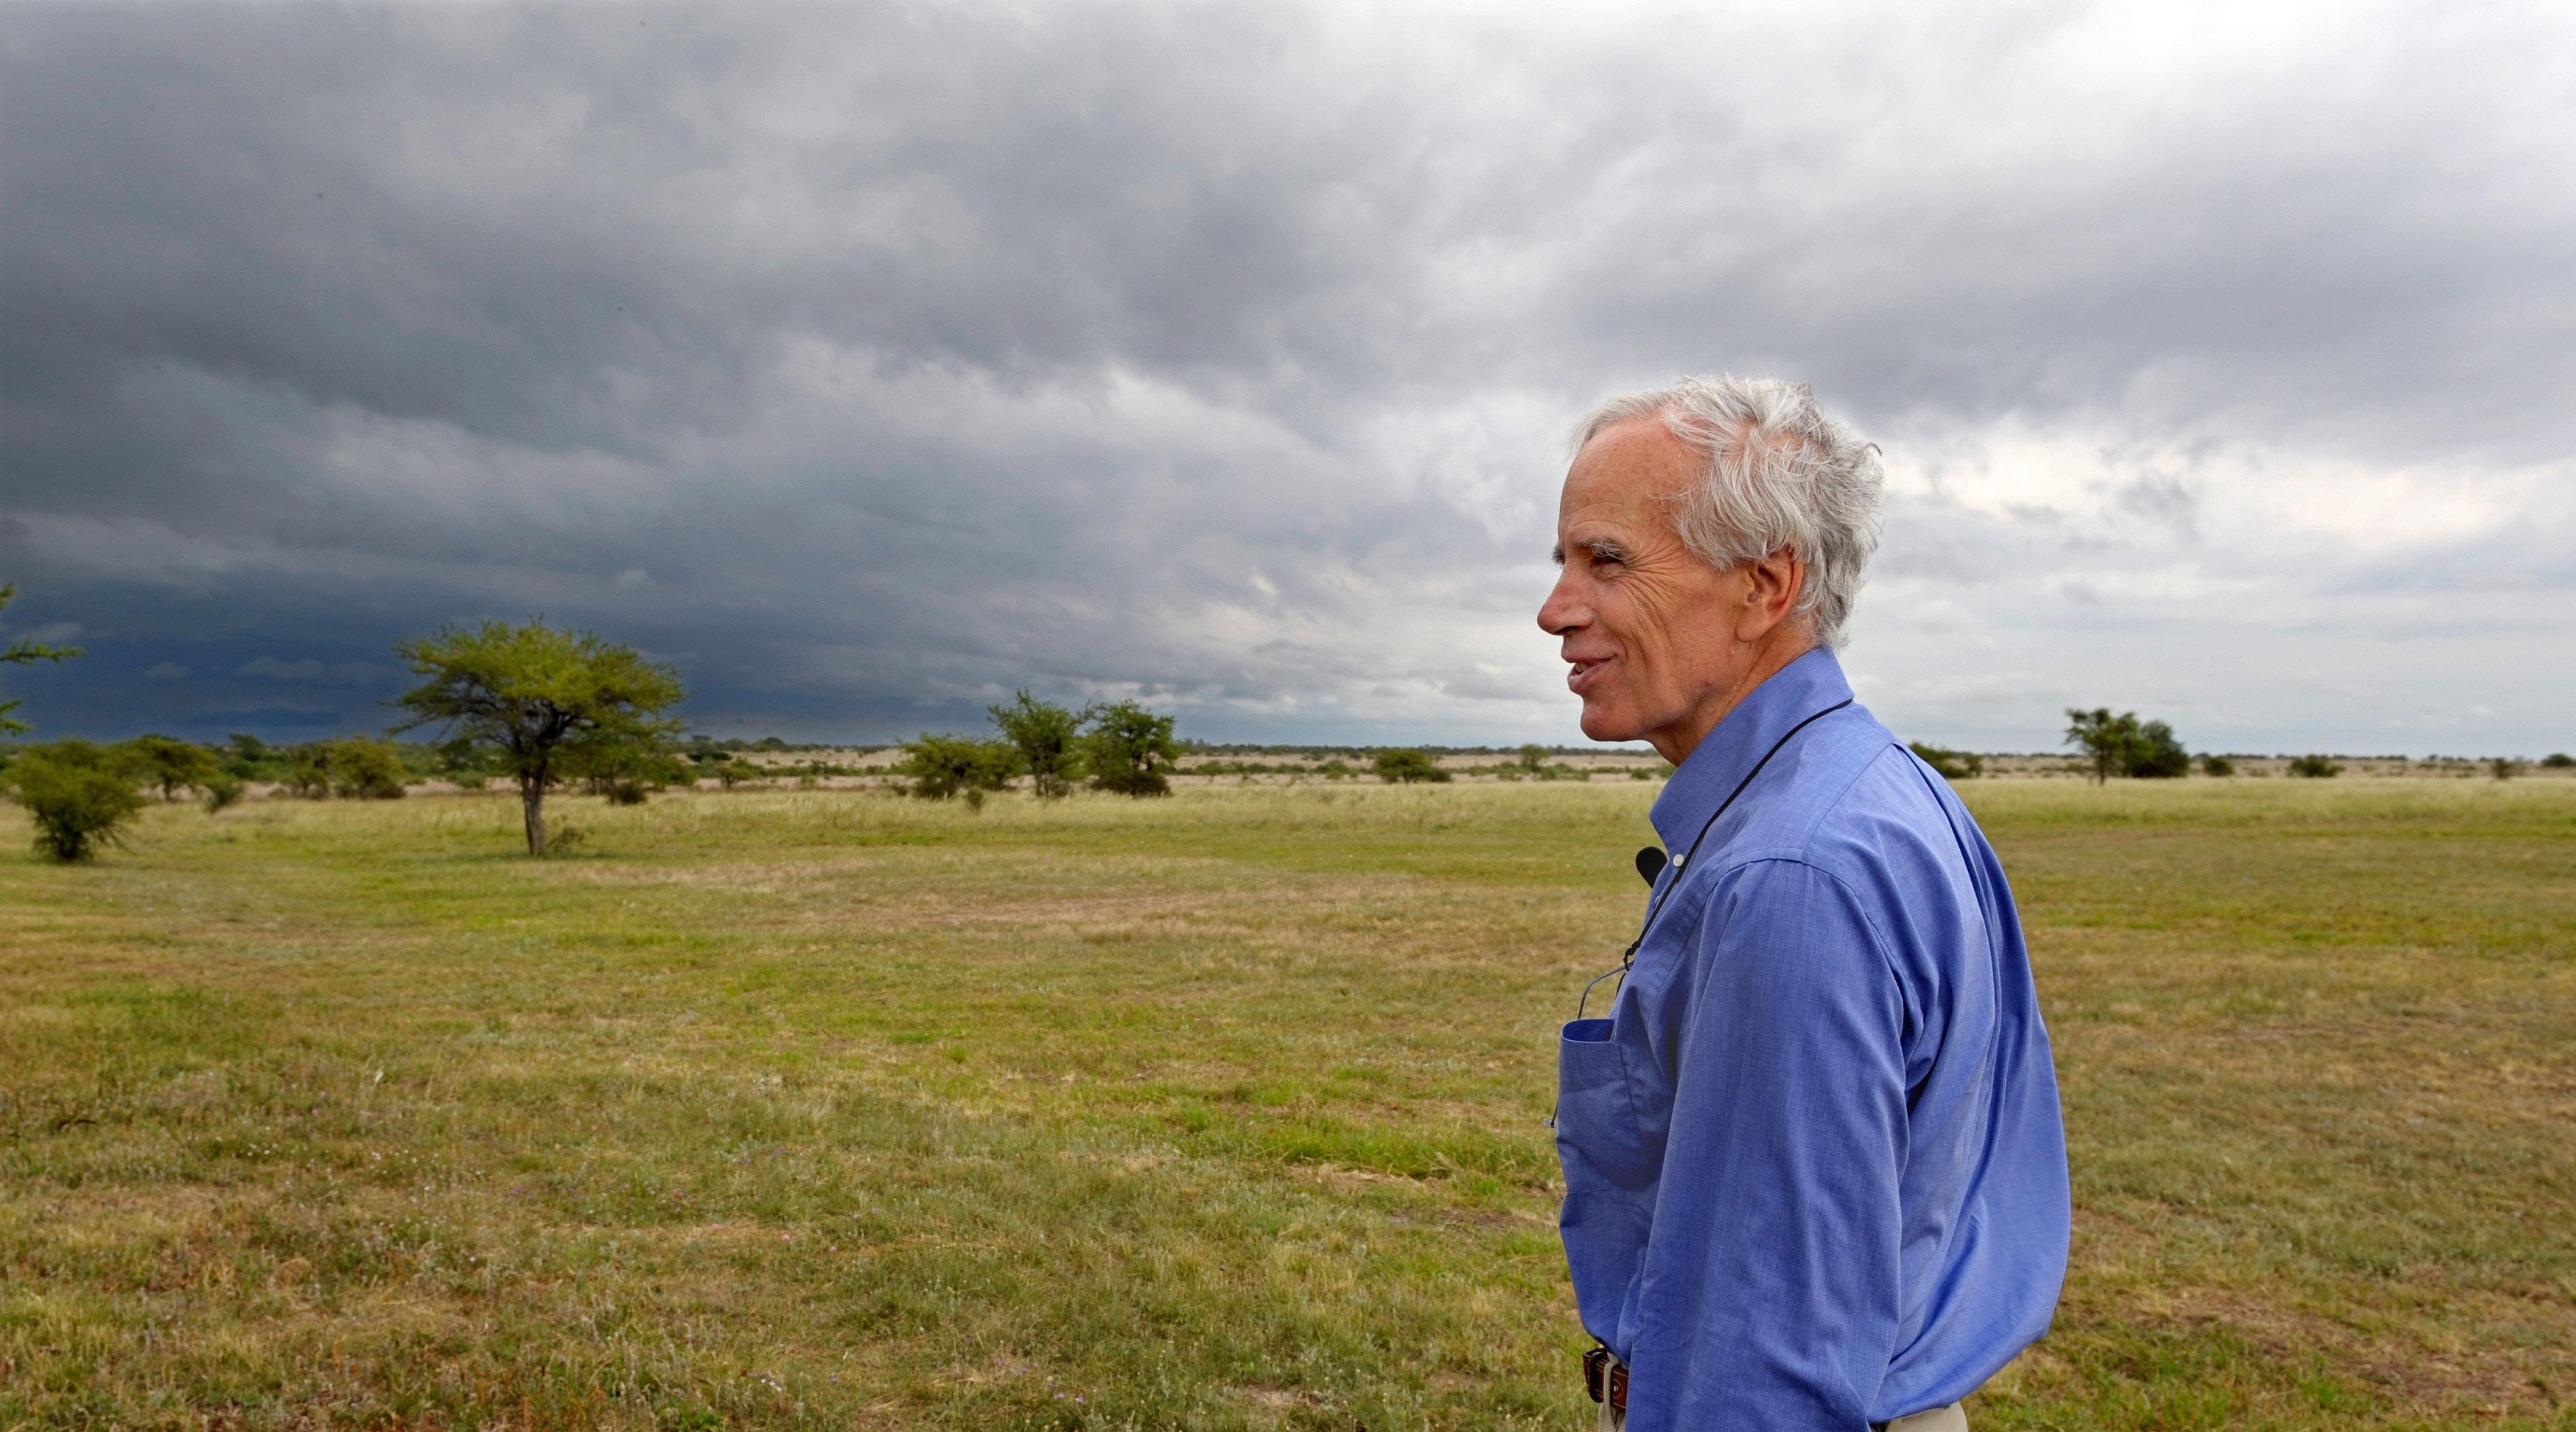 U.S. billionaire Douglas Tompkins poses in his property in Ibera, near Carlos Pellegrini in Corrientes Province, Argentina, o